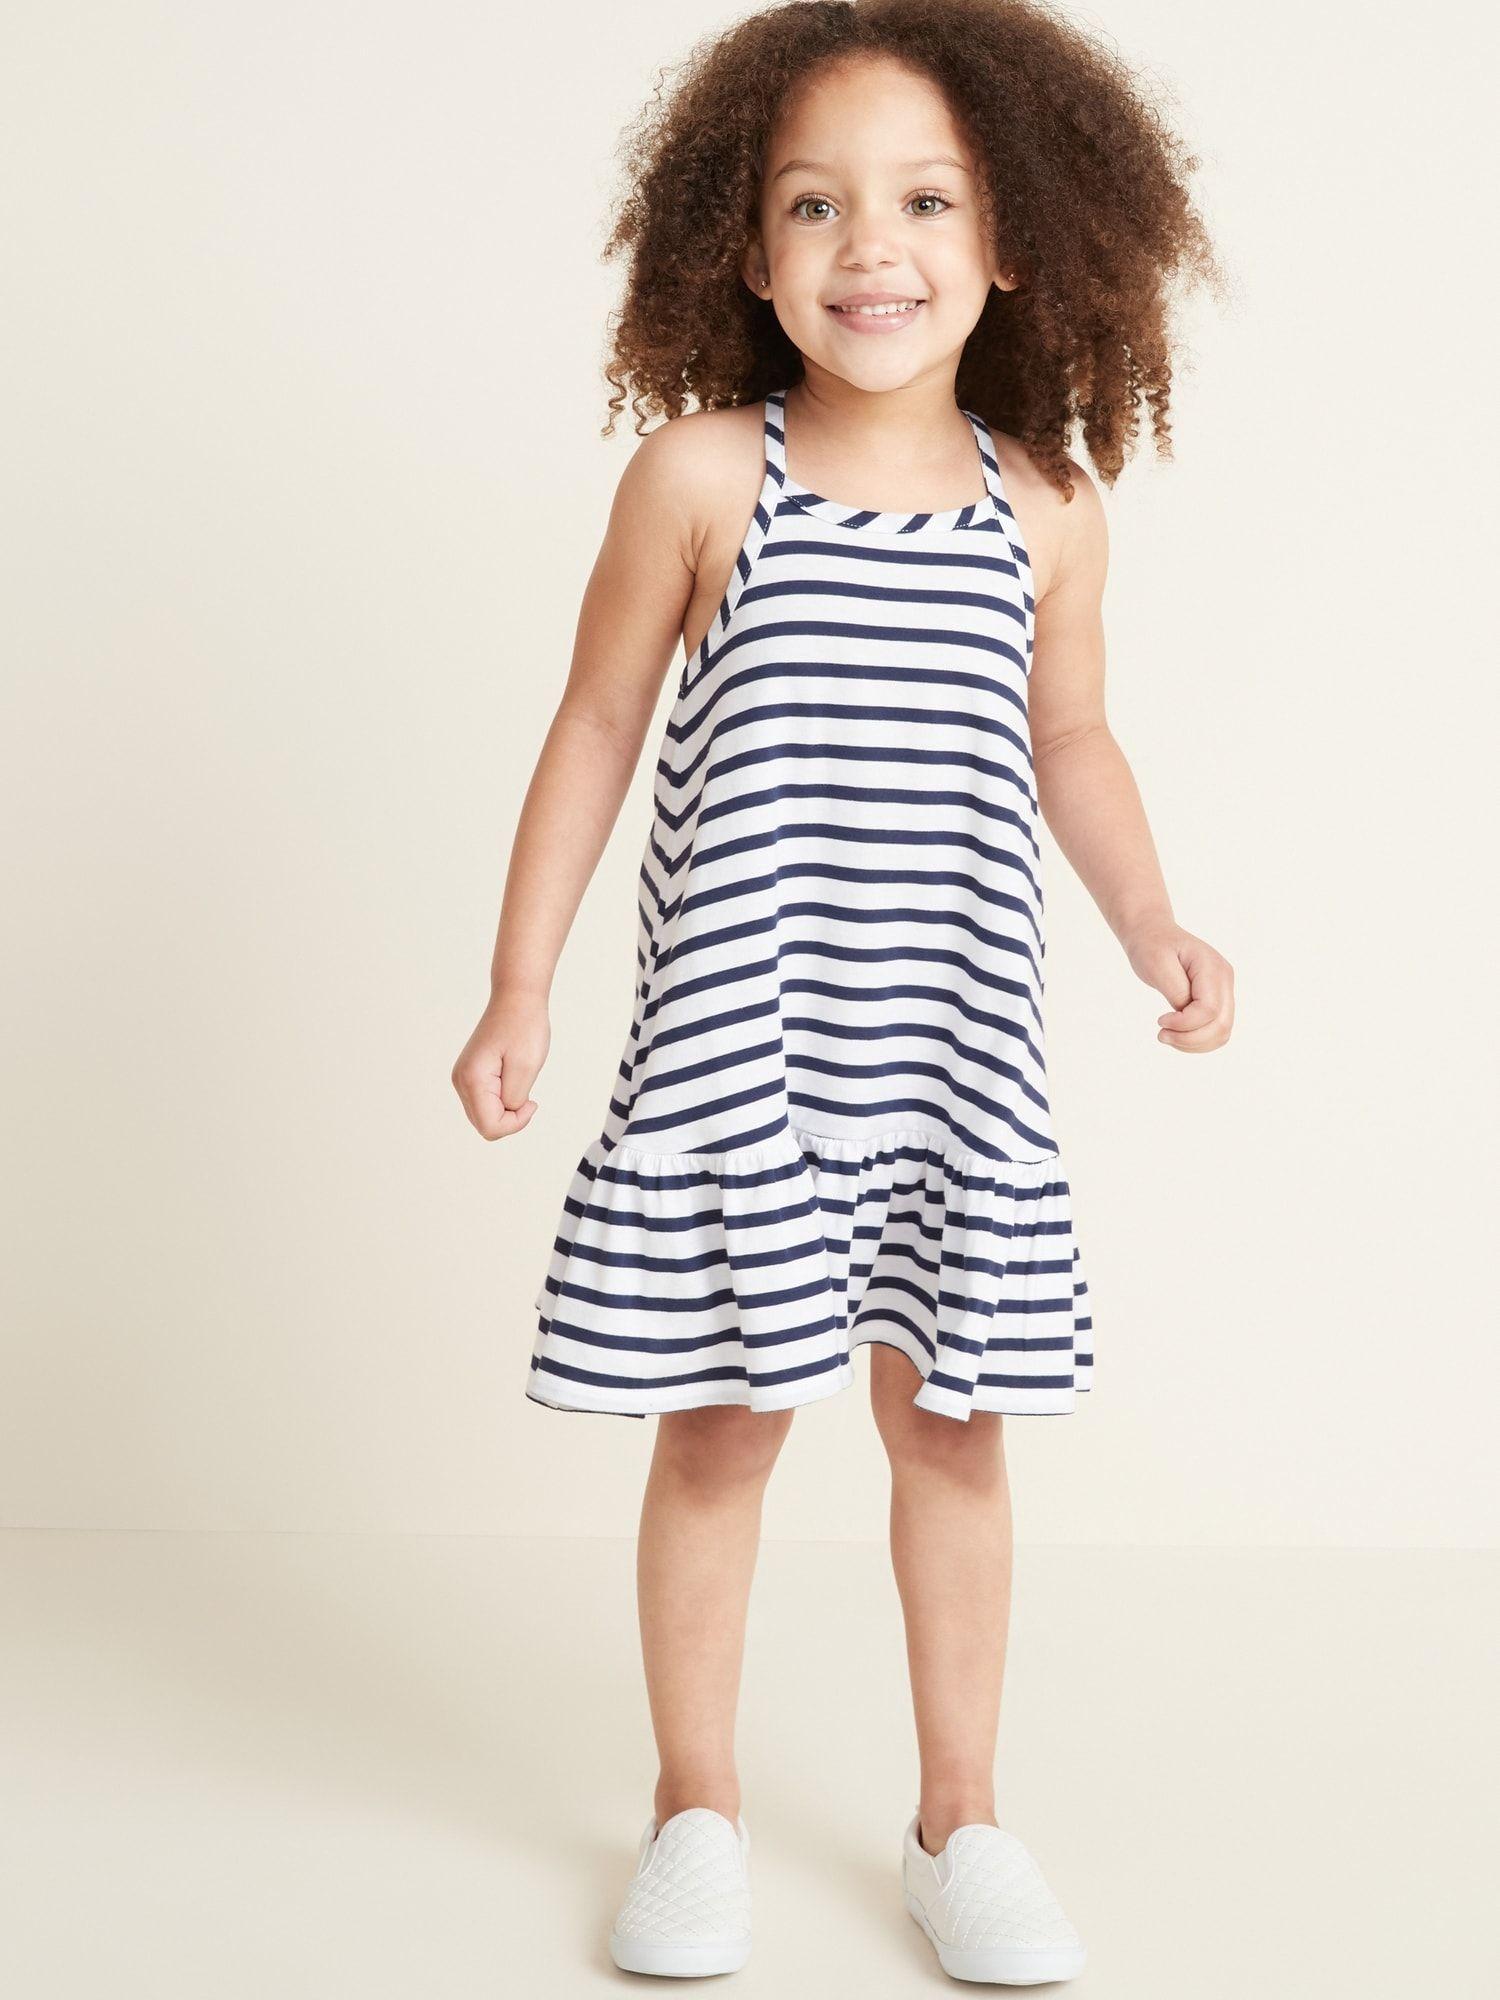 Sleeveless Tiered Swing Dress For Toddler Girls Old Navy Toddler Girl Dresses Kids Dress Designer Childrens Clothes [ 2000 x 1500 Pixel ]